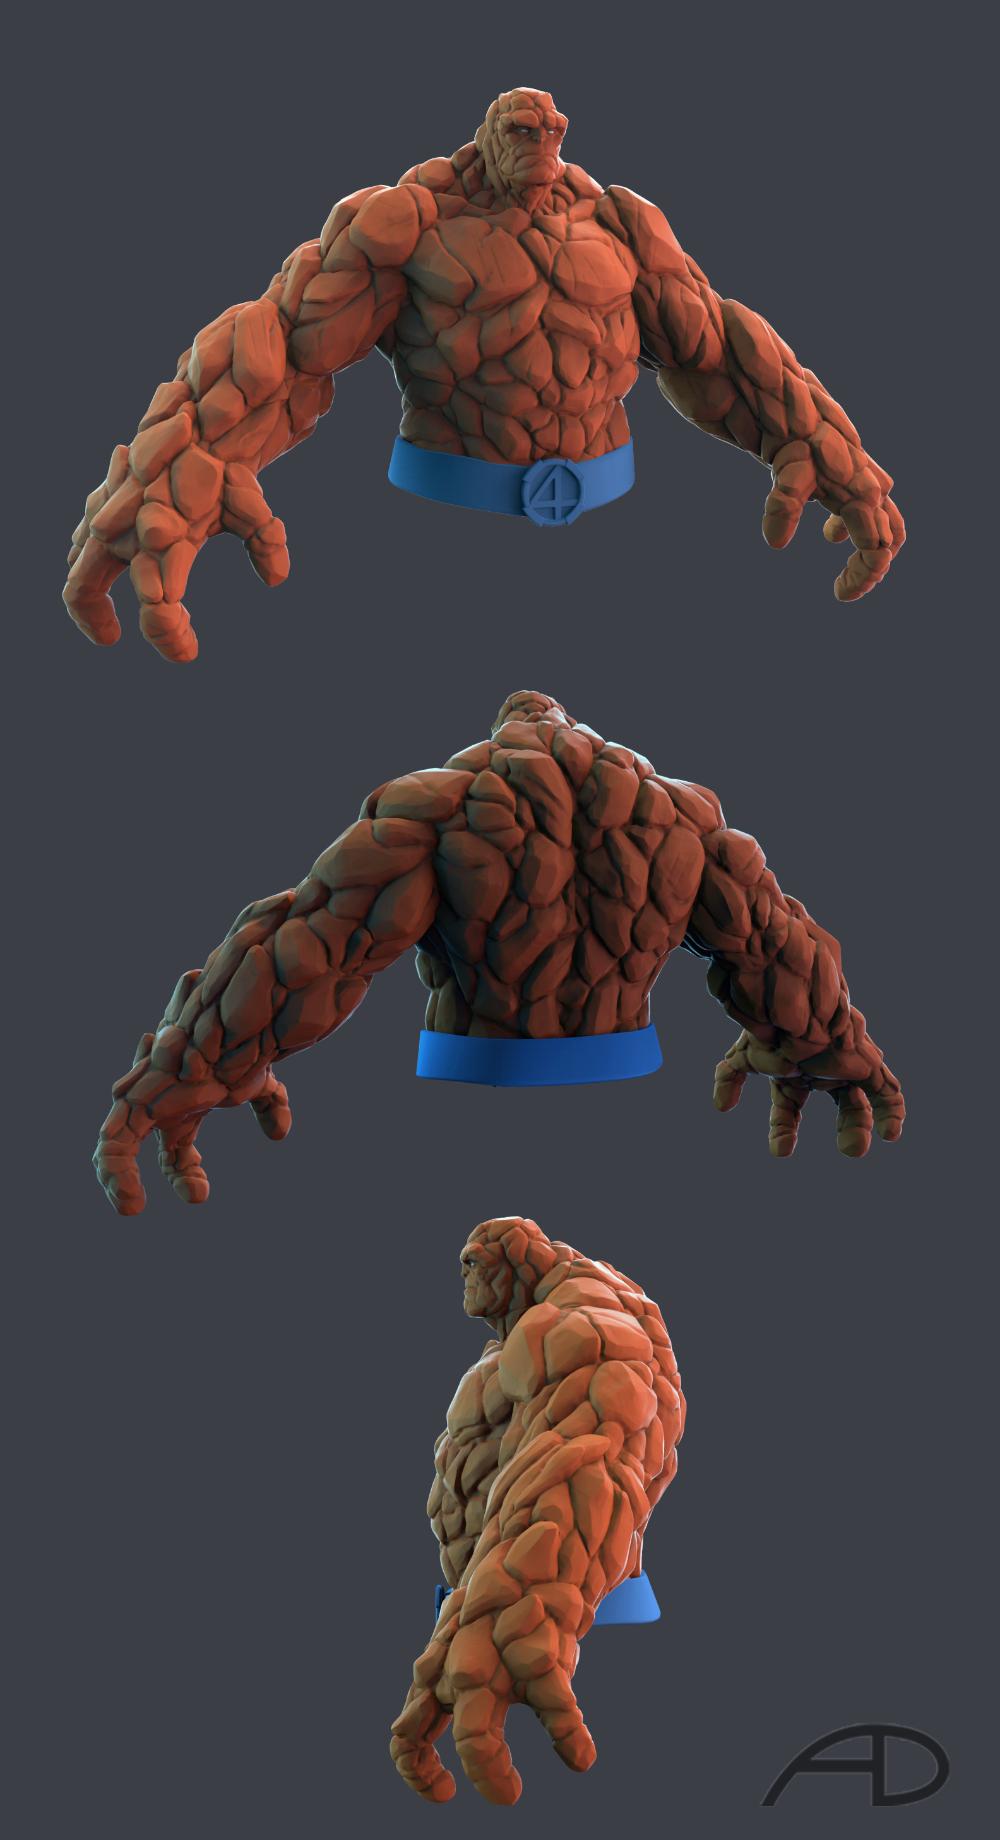 Artstation The Thing Aaron Dey In 2021 Marvel Statues Superhero Art Fantastic Four Marvel